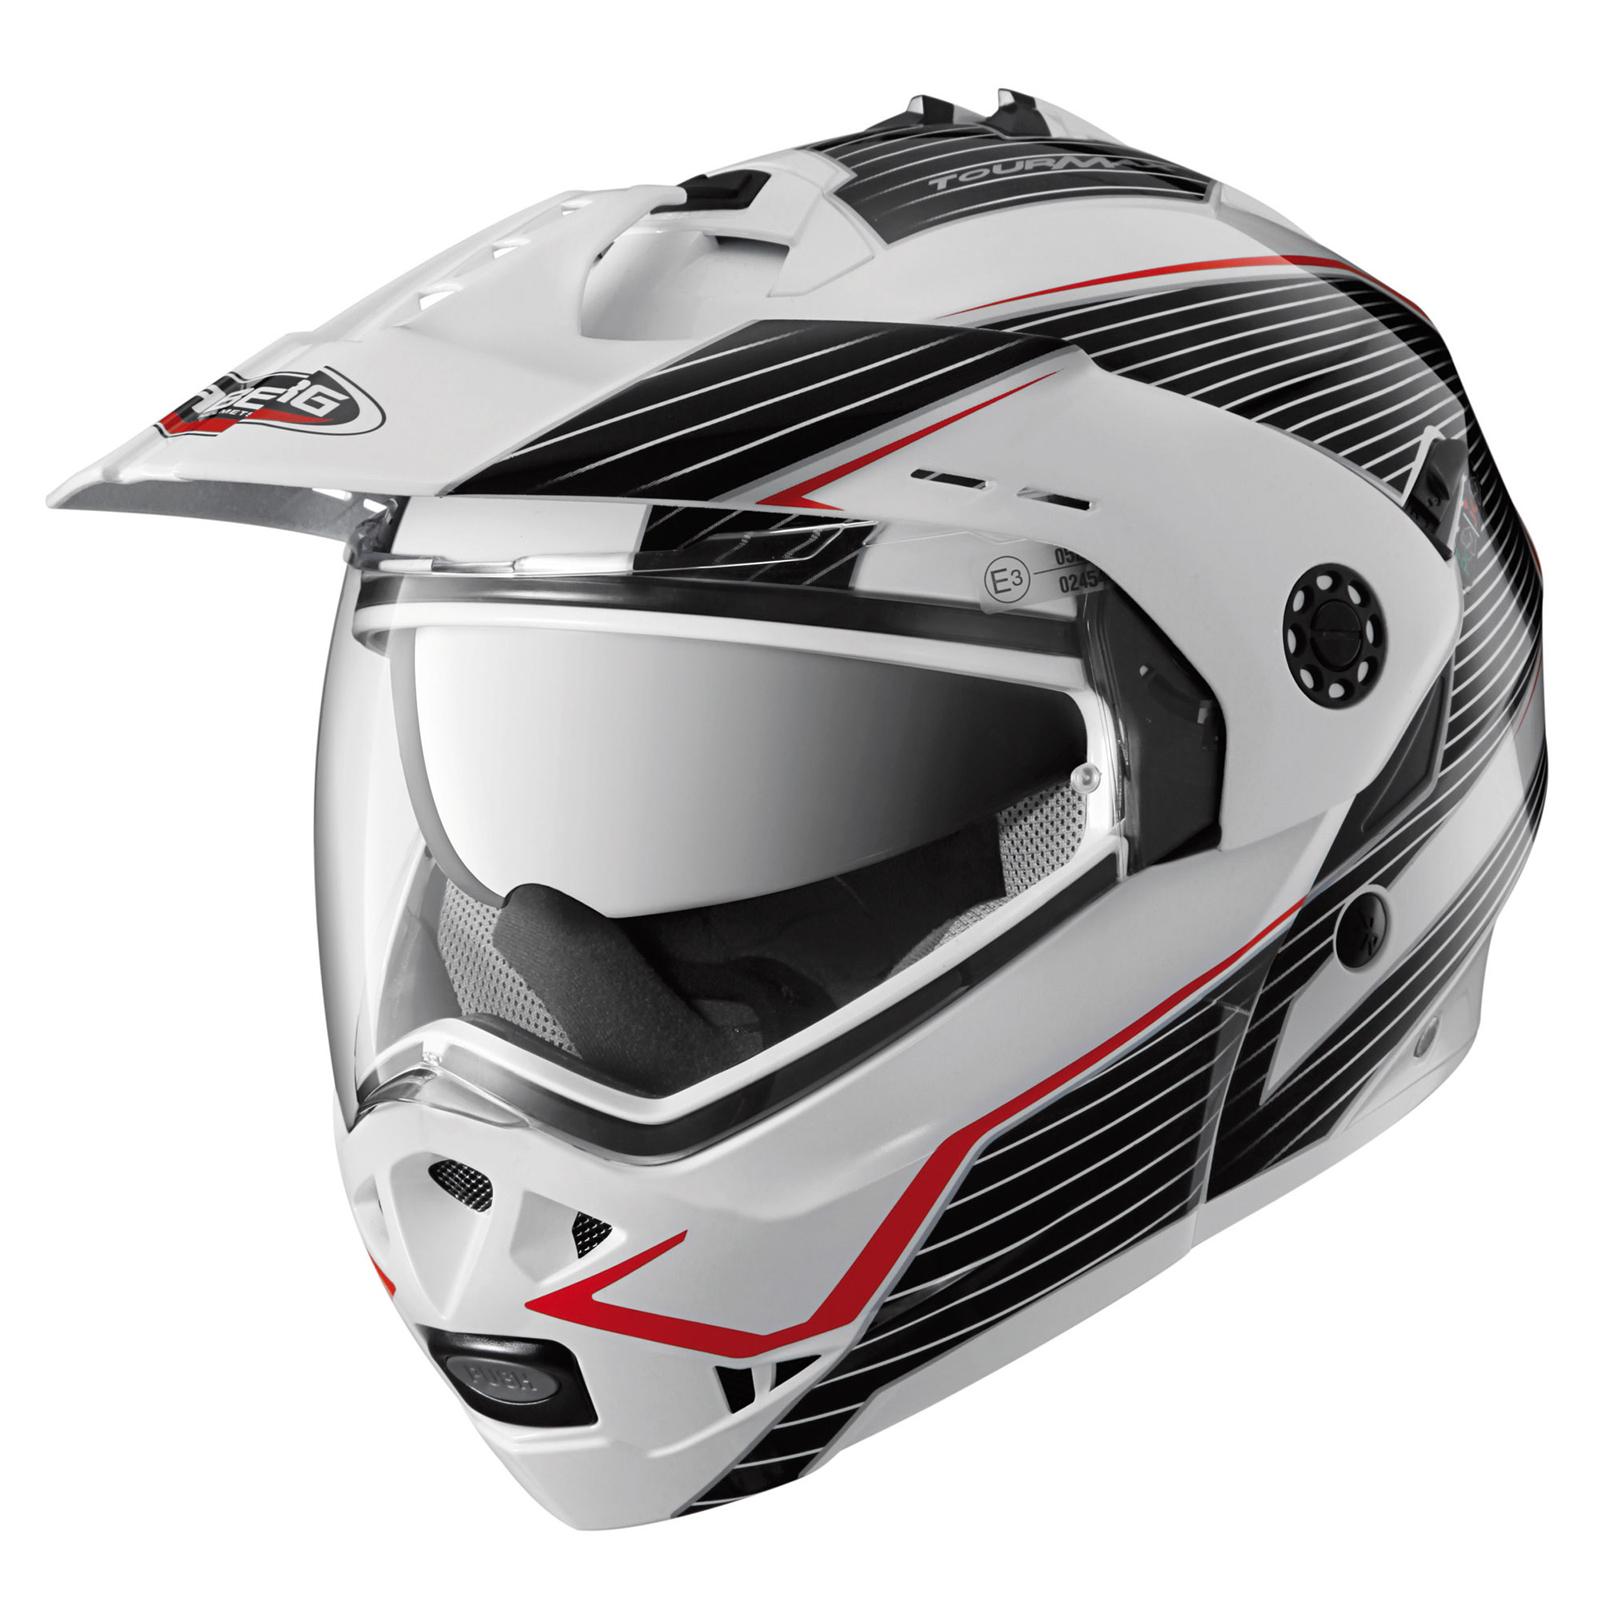 CABERG-TOURMAX-SONIC-CASQUE-MOTO-SCOOTER-MODULABLE-MOTOCROSS-CROSS-URBAIN-MX